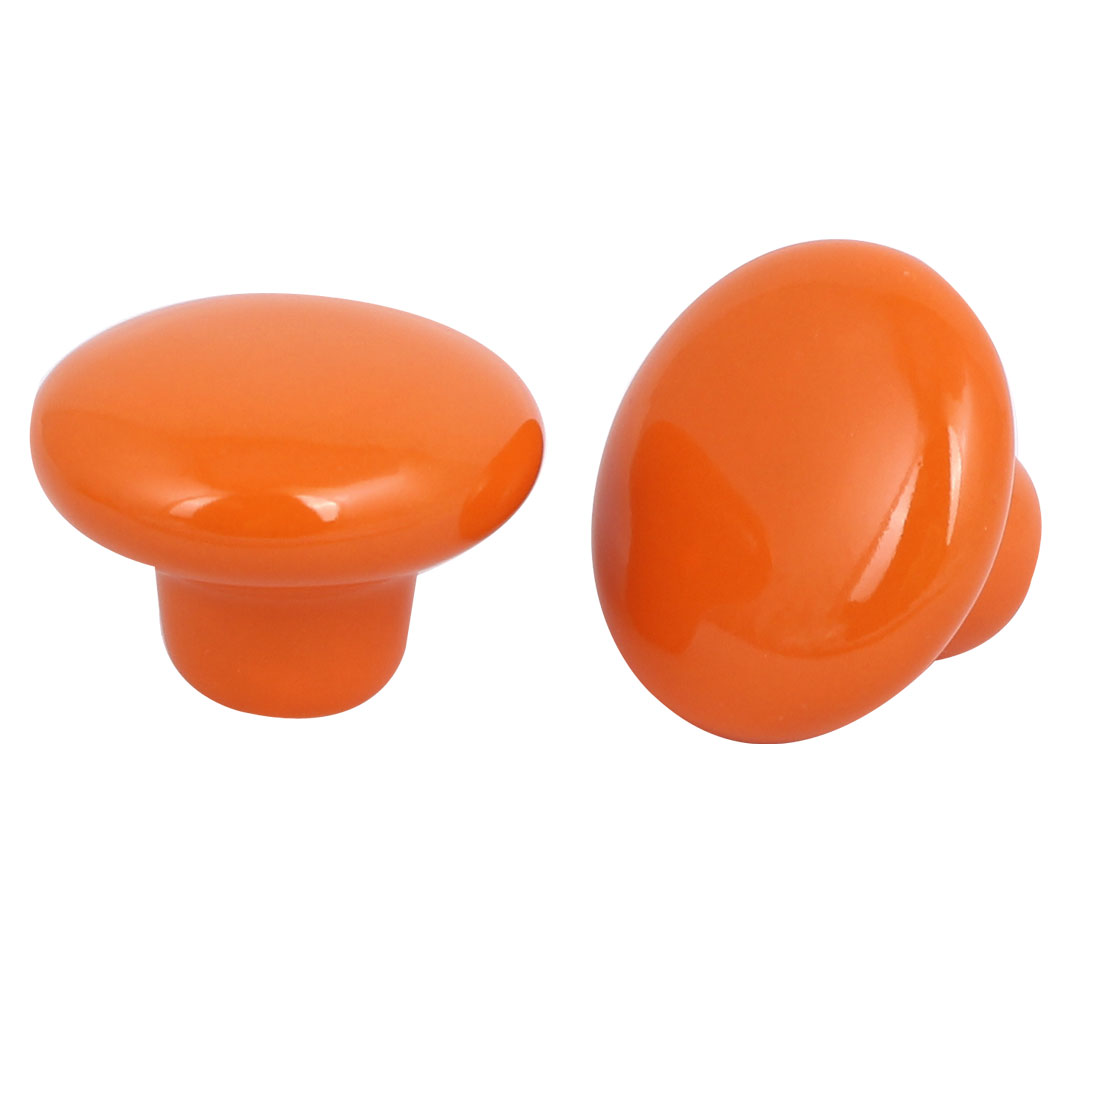 Wardrobe Drawer Ceramic Round Pull Handles Knobs Orange 33mm Dia 2pcs